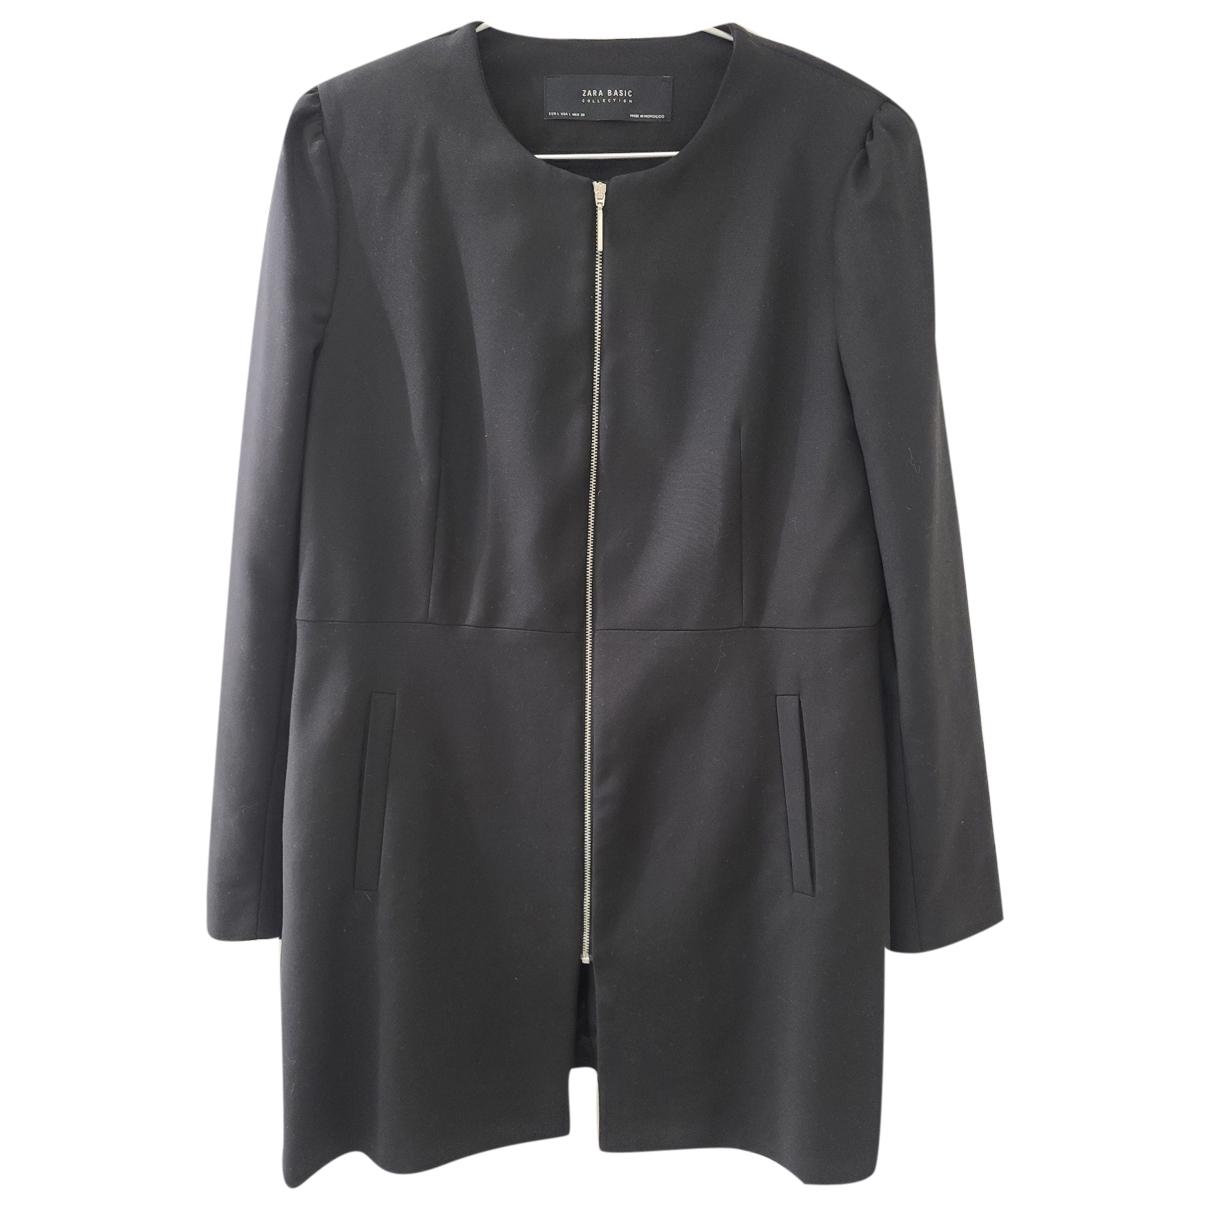 Zara \N Black jacket for Women L International